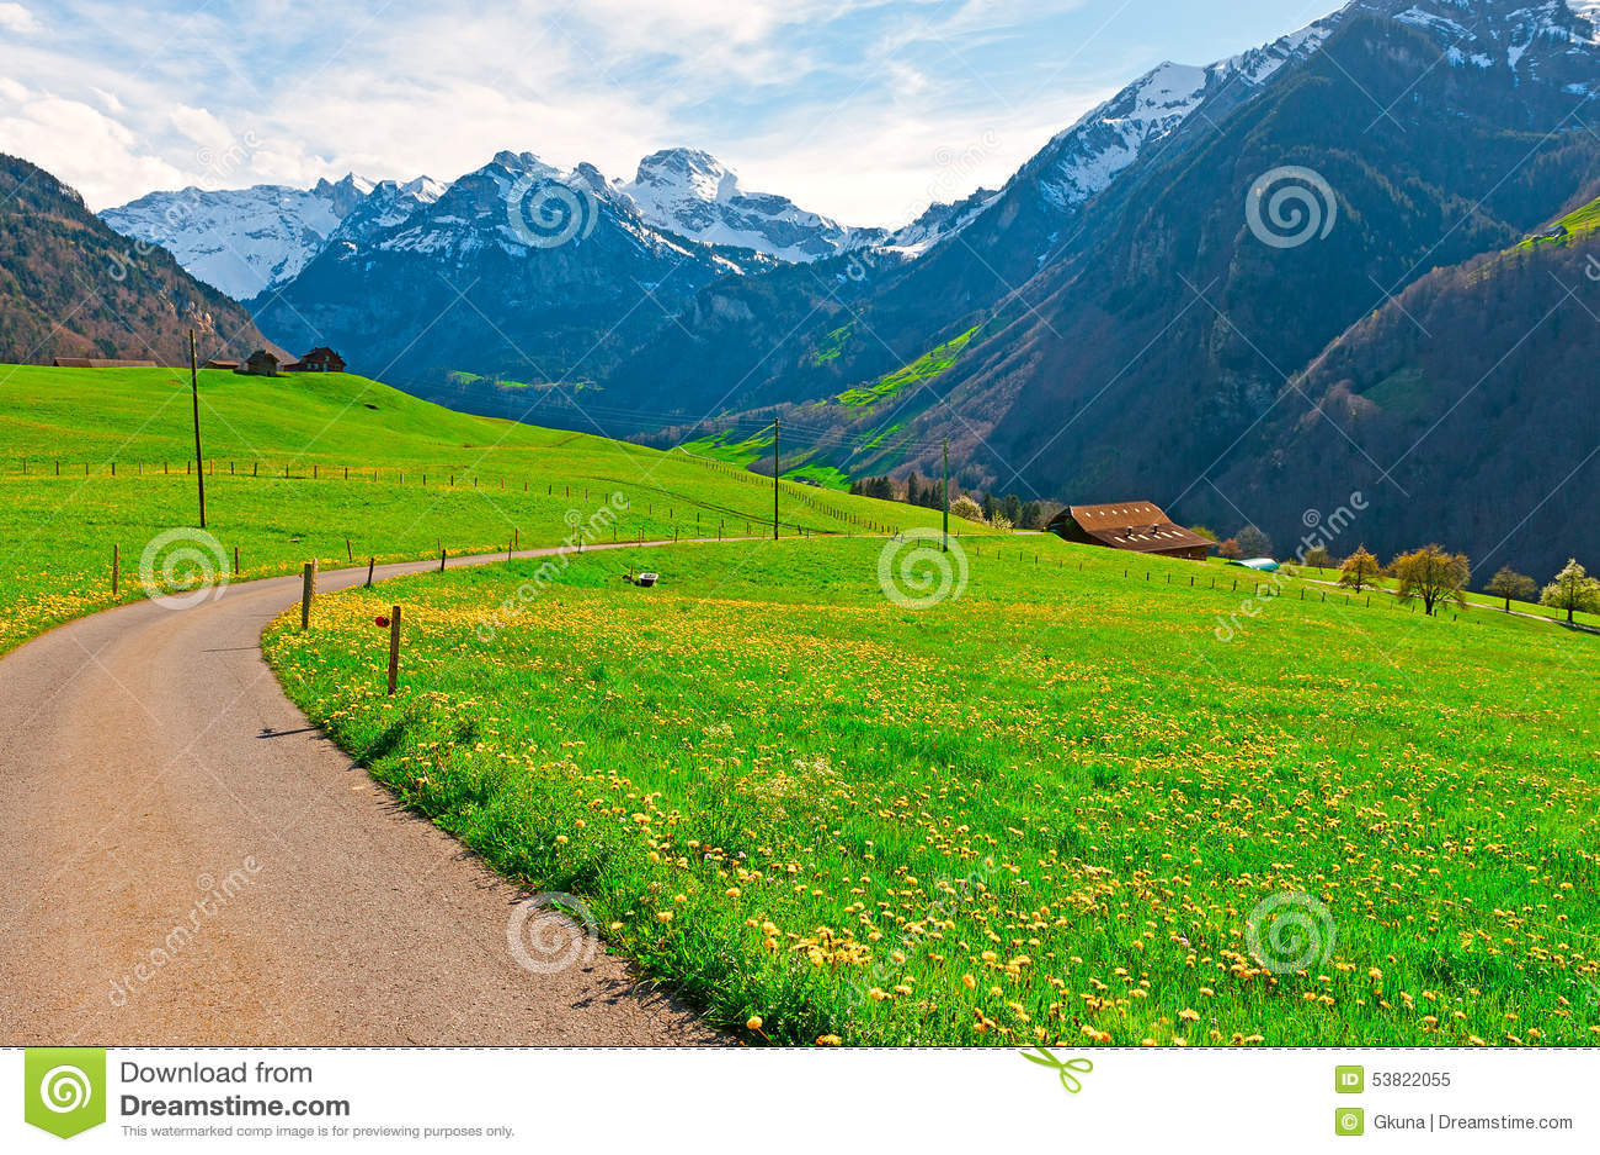 Asphalt Path